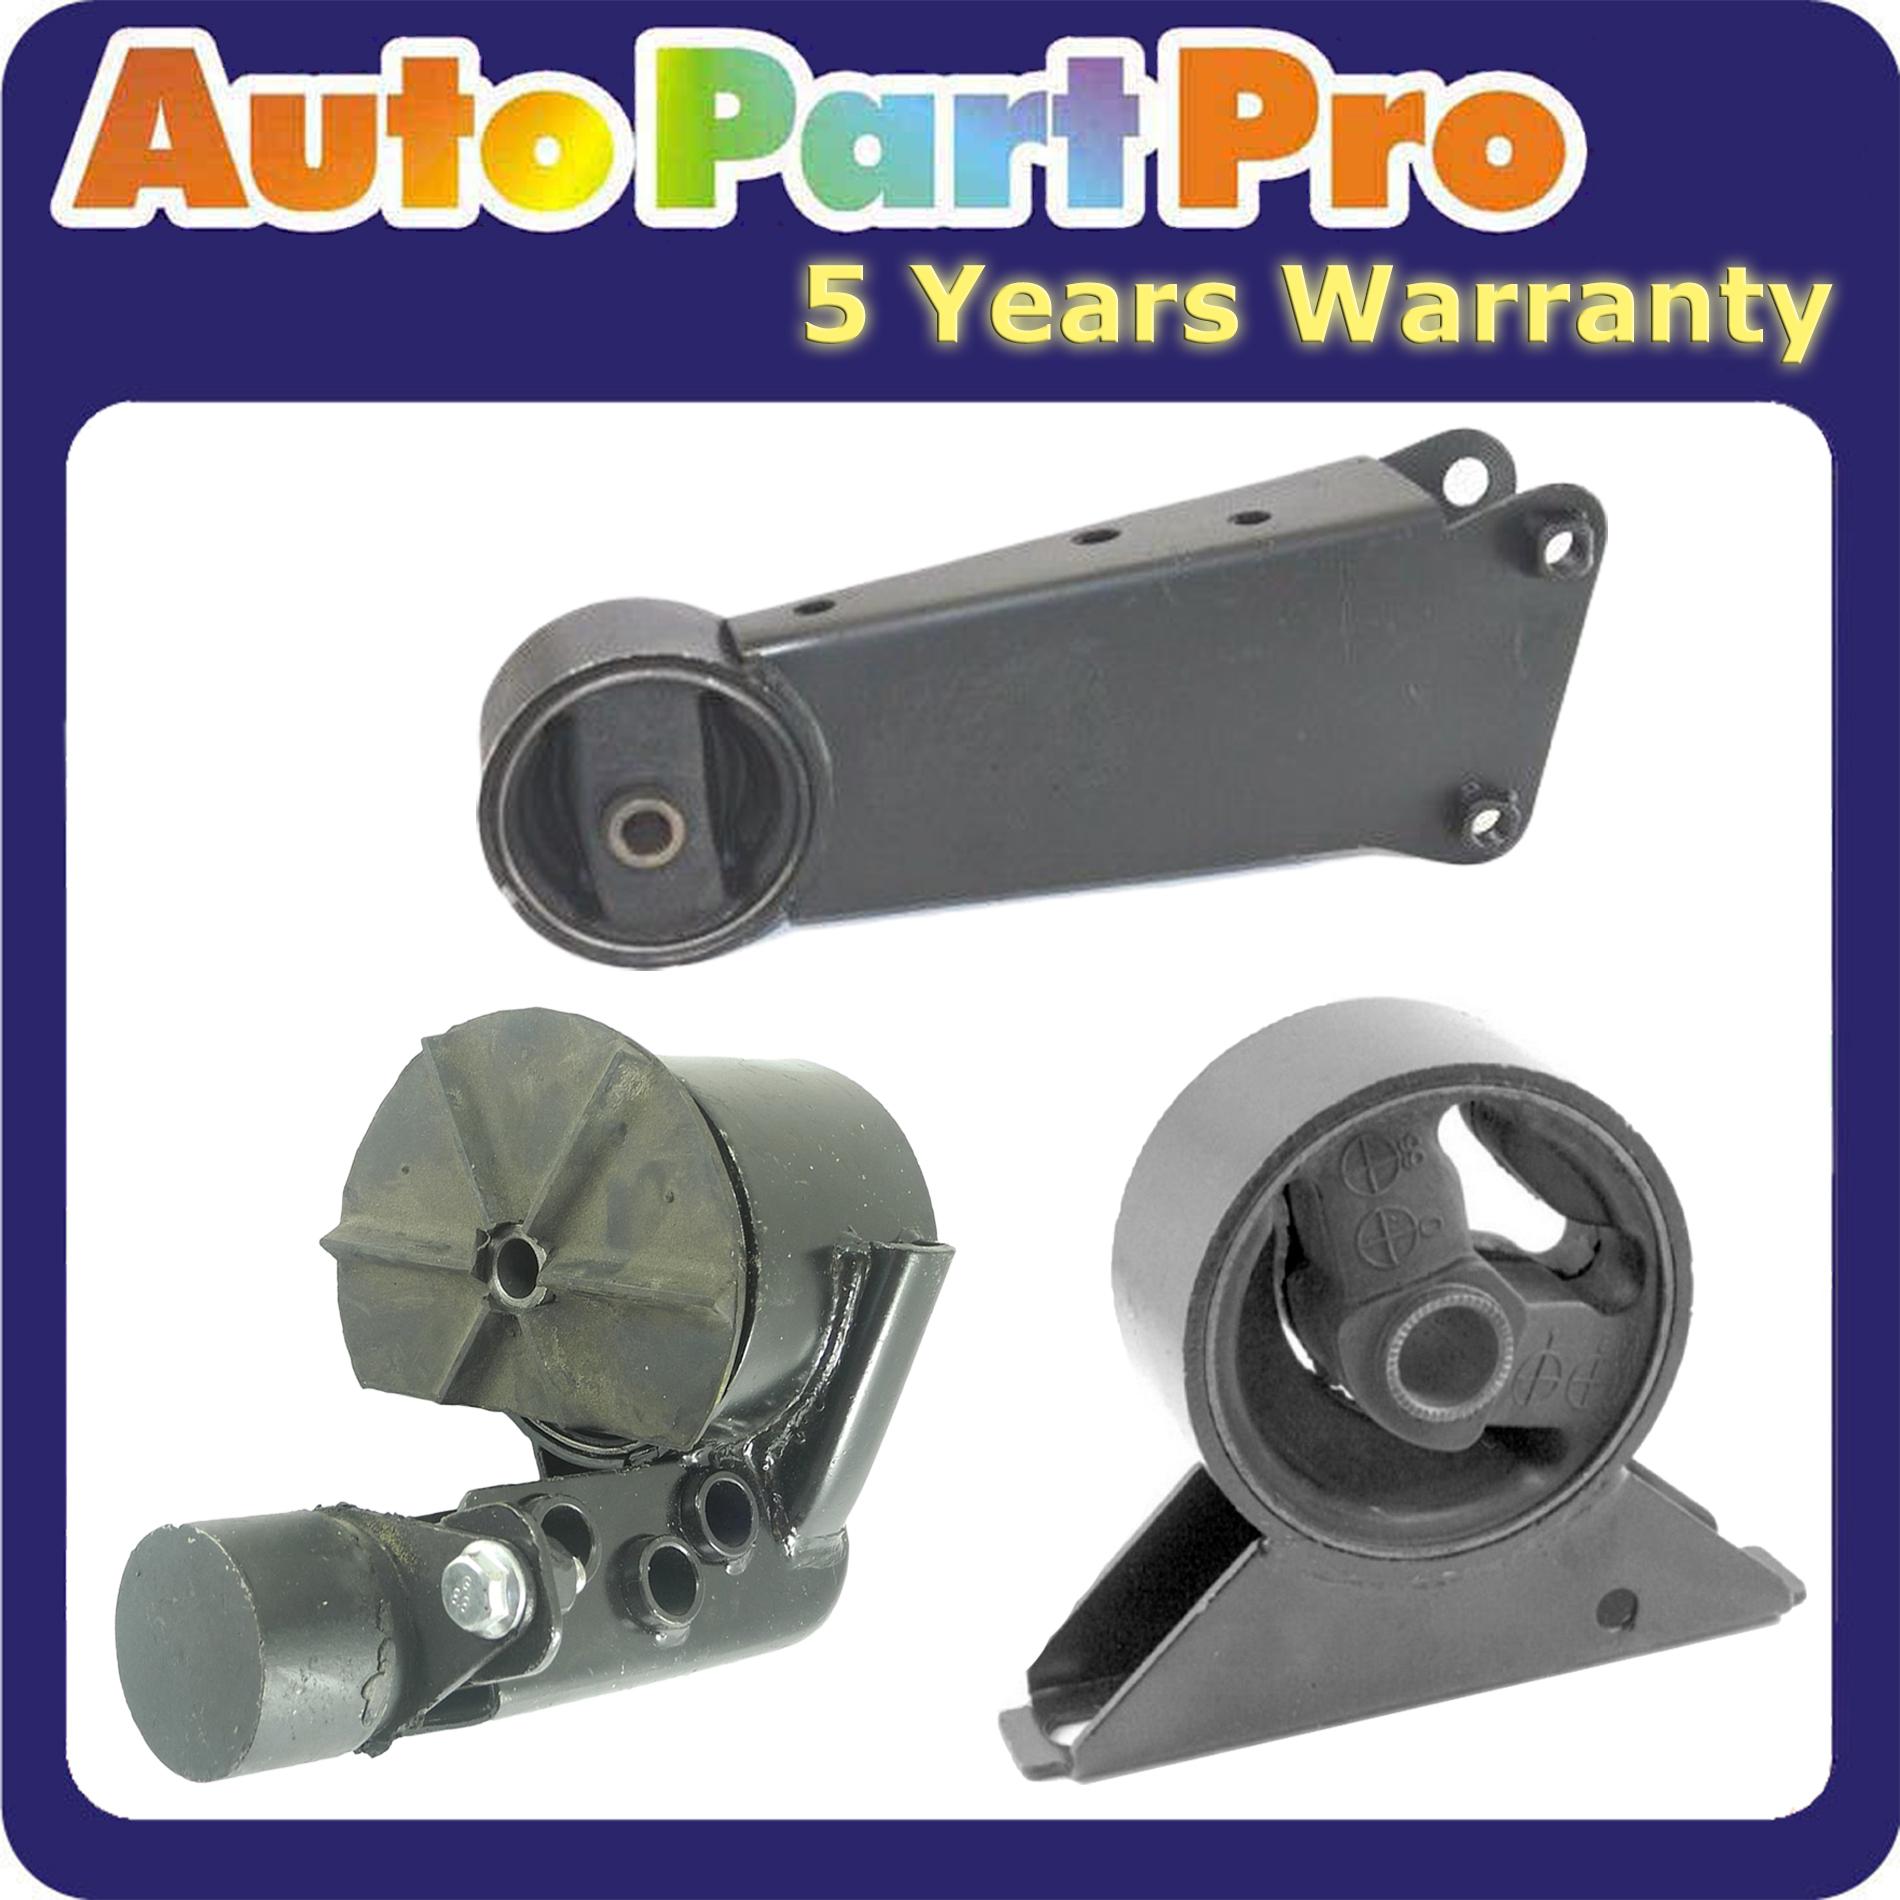 Front Left /& Rear Engine Motor Mount Set 3PCS 2000-2003 for Hyundai Accent 1.5L